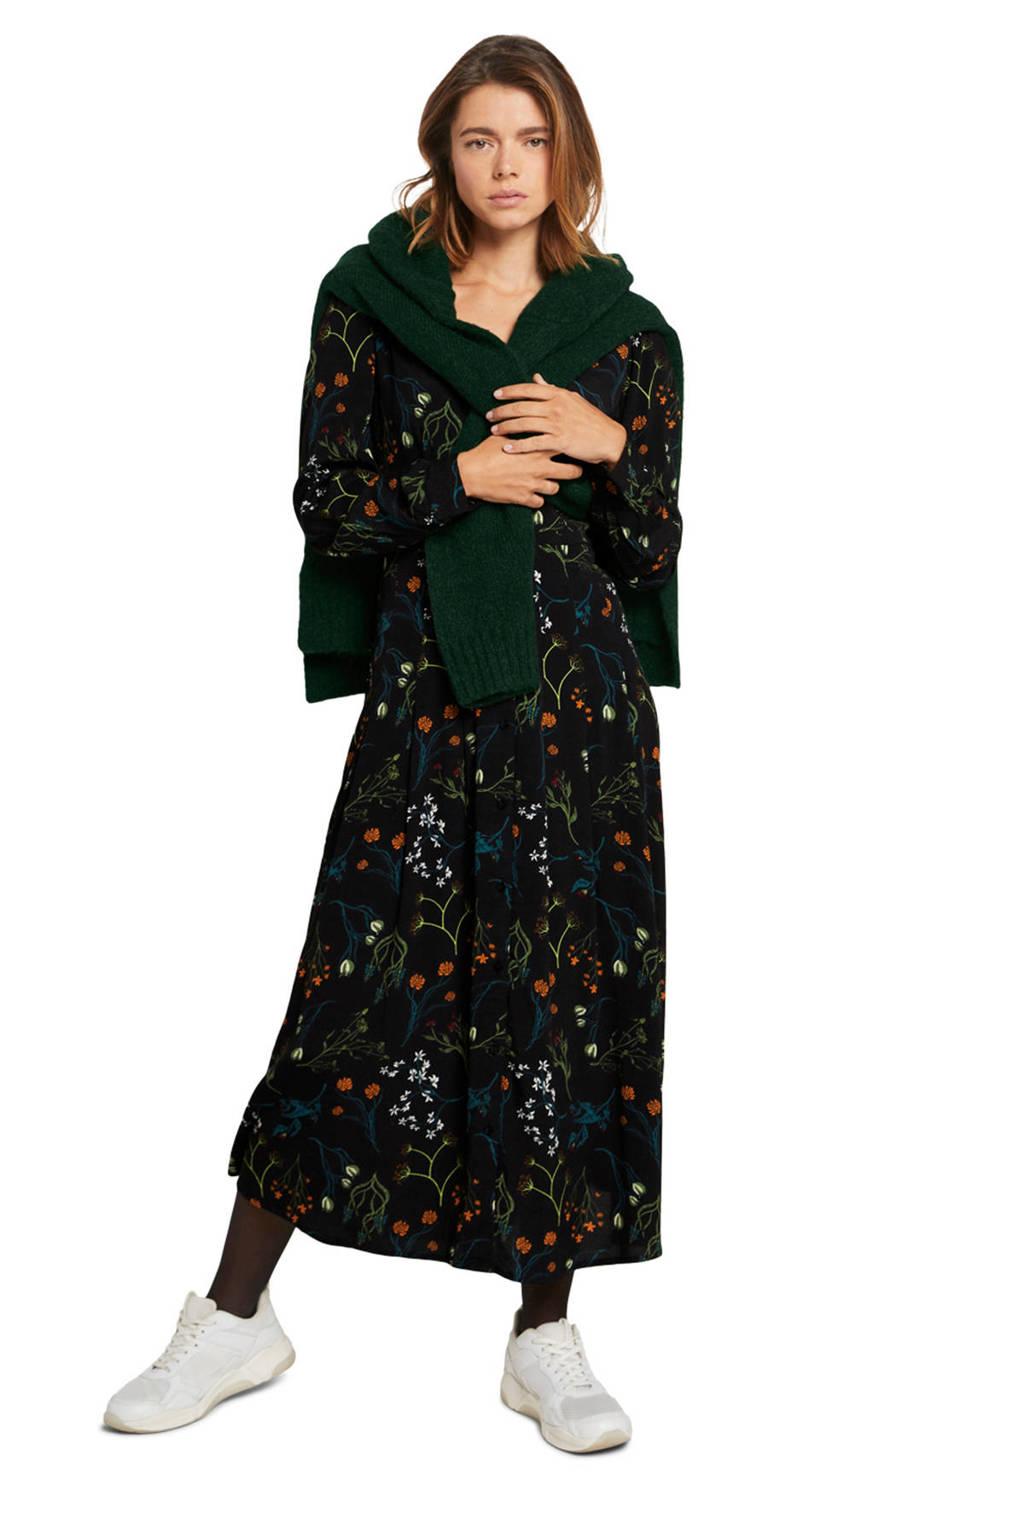 Tom Tailor Denim gebloemde blousejurk zwart/groen/blauw, Zwart/groen/blauw